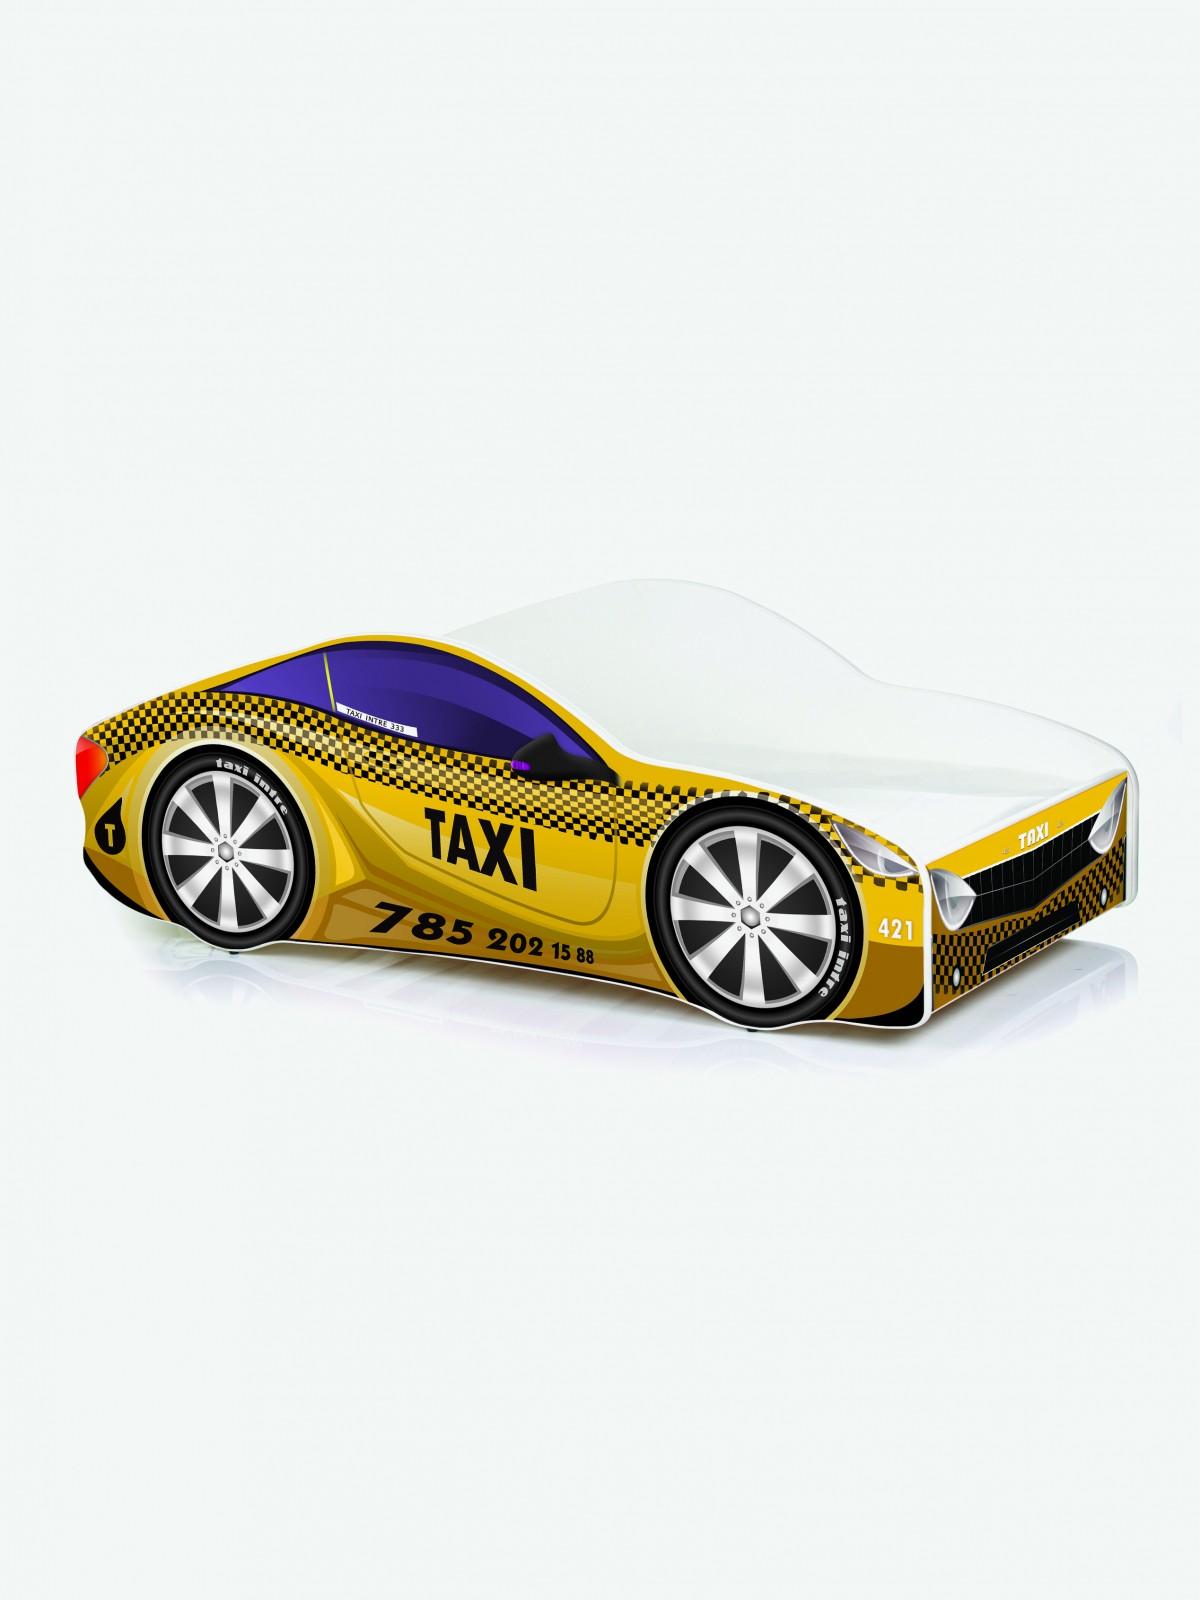 auto kinderbett nobiko mit matratze und lattenrost taxi. Black Bedroom Furniture Sets. Home Design Ideas